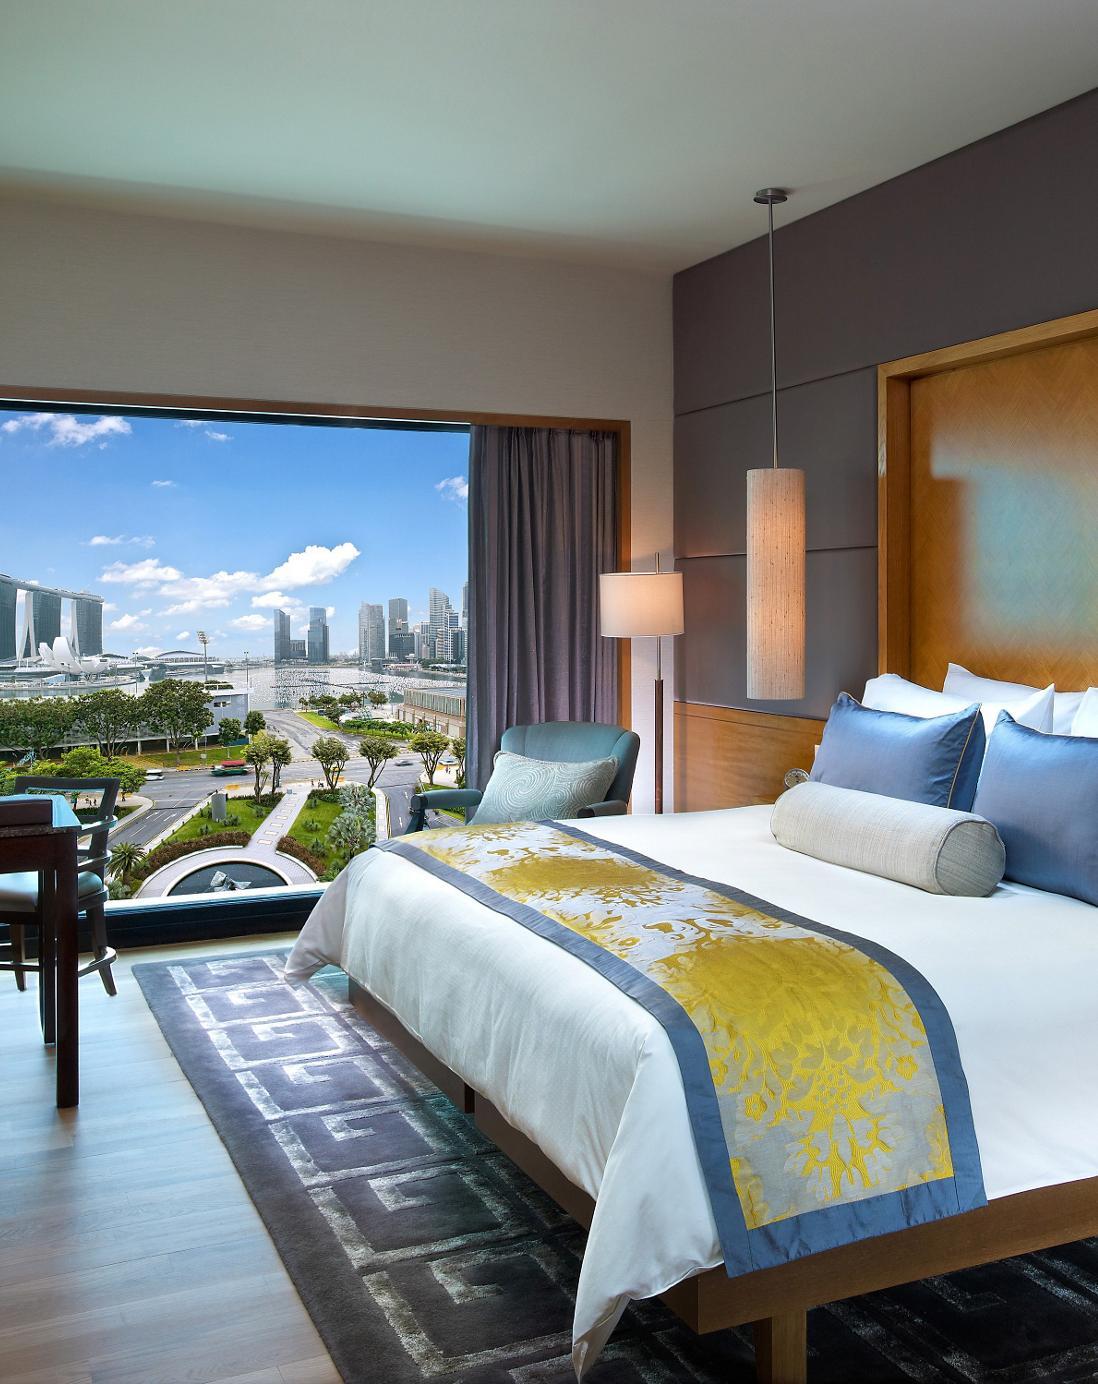 singapore-suite-bay-suite-bedroom-1.jpeg